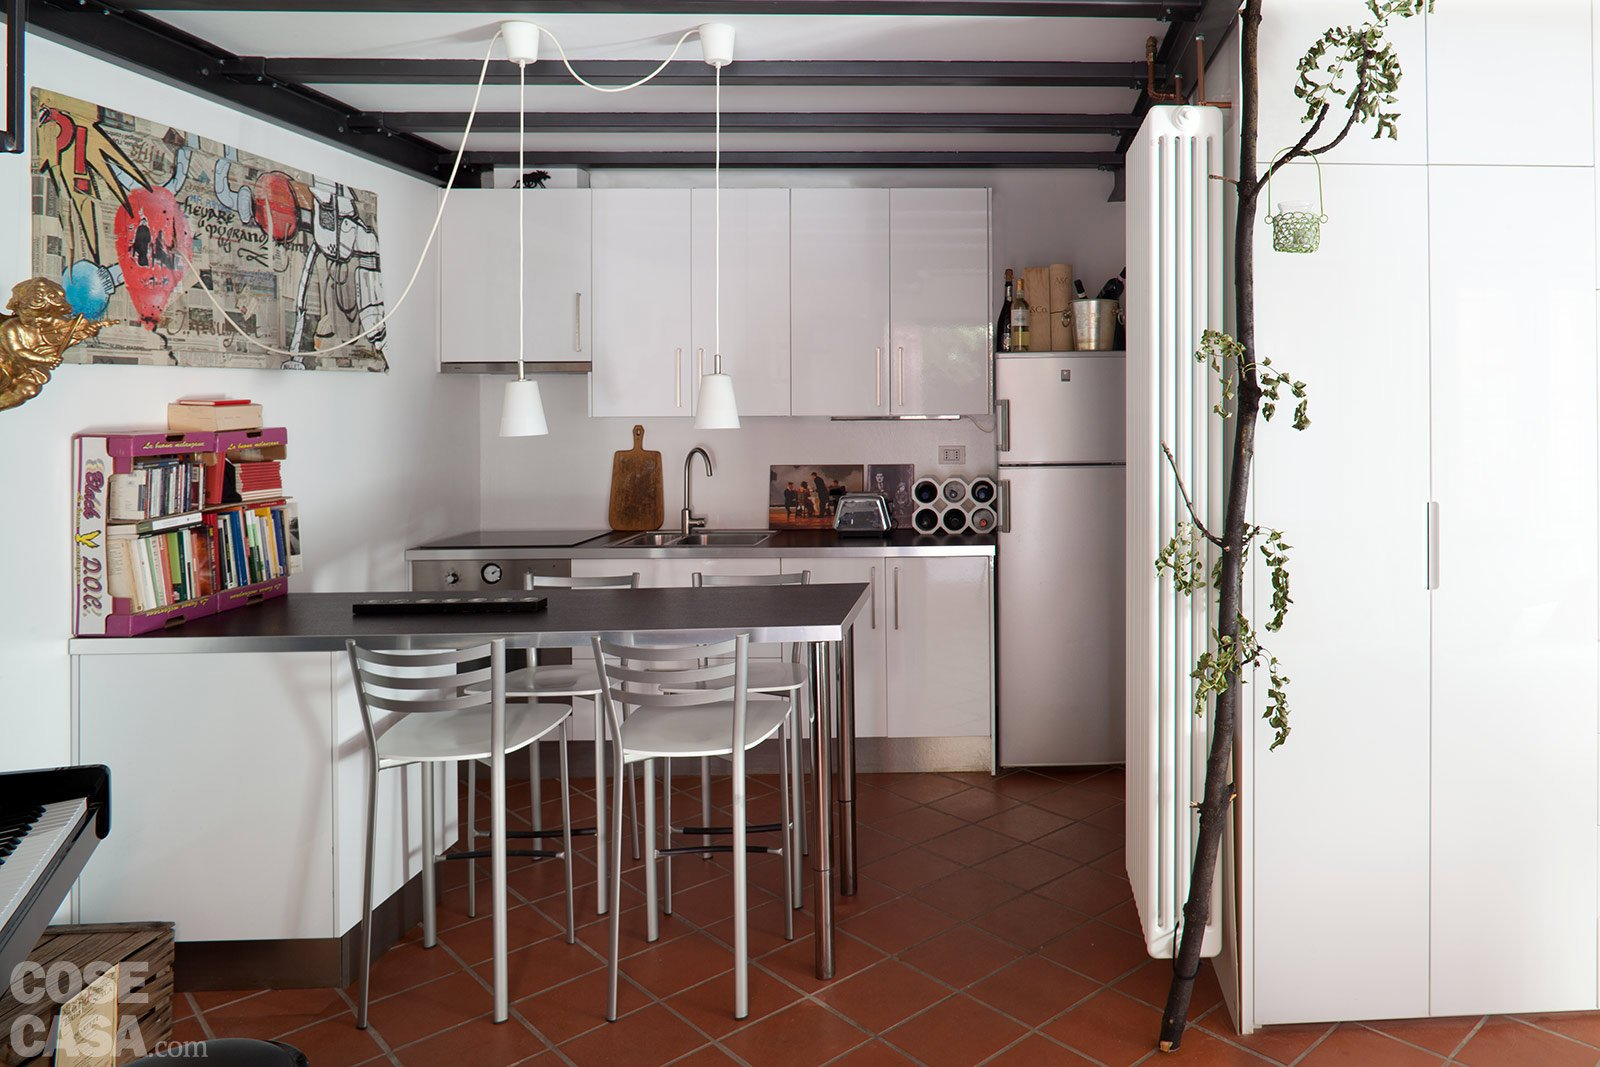 Da box a casa un incredibile trasformazione cose di casa - Cucina in casa ...